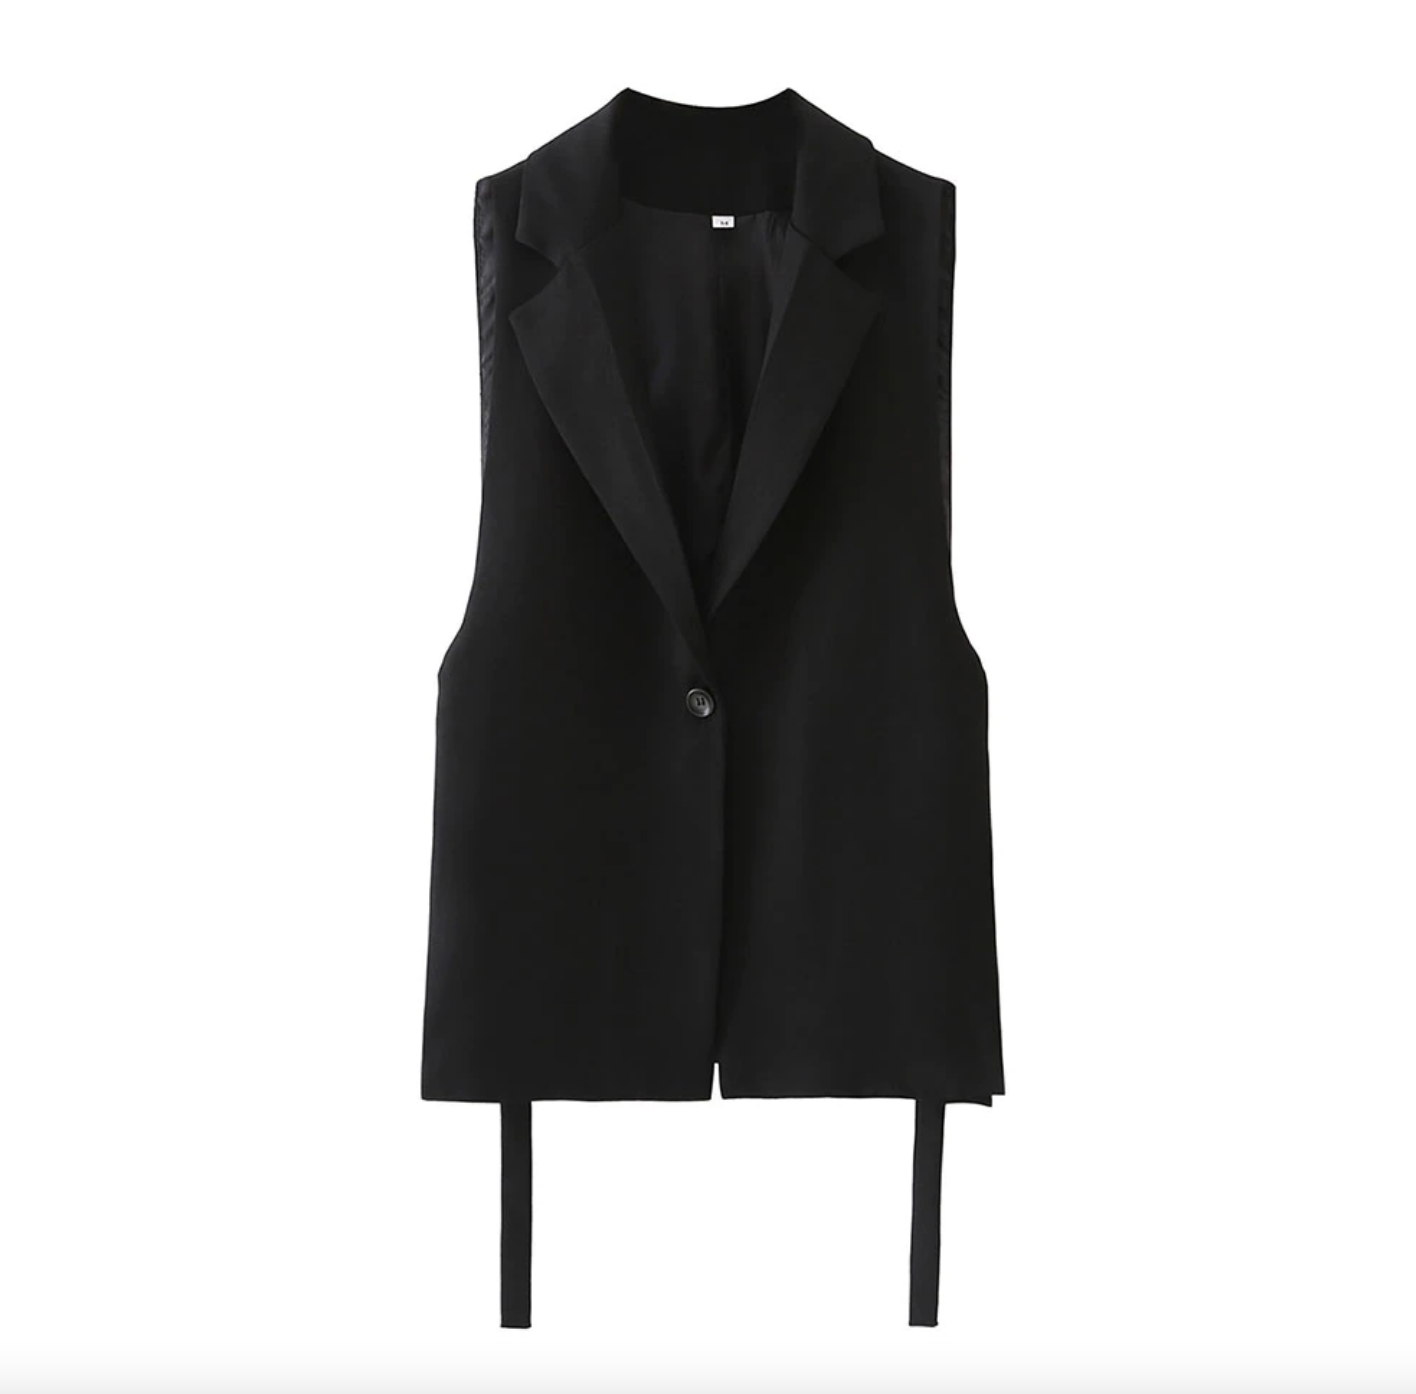 Suit Vest Trend: 5 Fall 2021 Must Have Pieces!